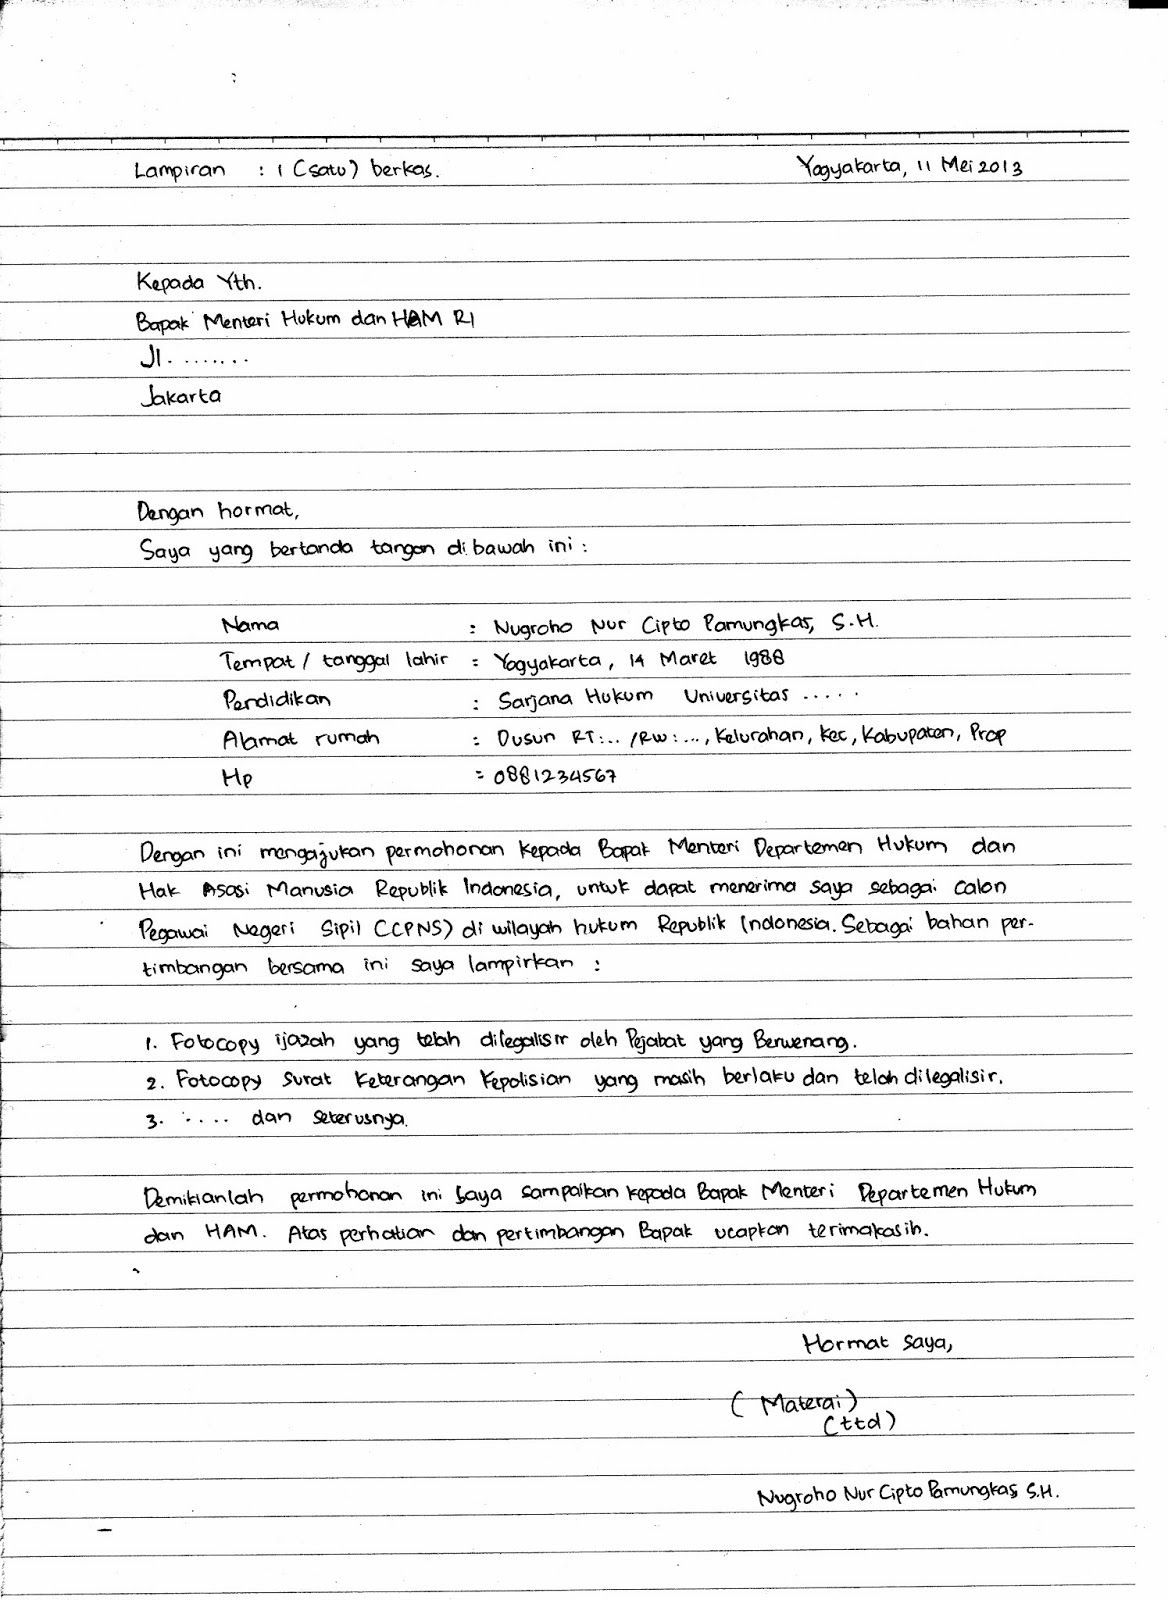 Surat Lamaran Kerja Harus Tulis Tangan Tulisan Tangan Tulisan Akuntansi Keuangan